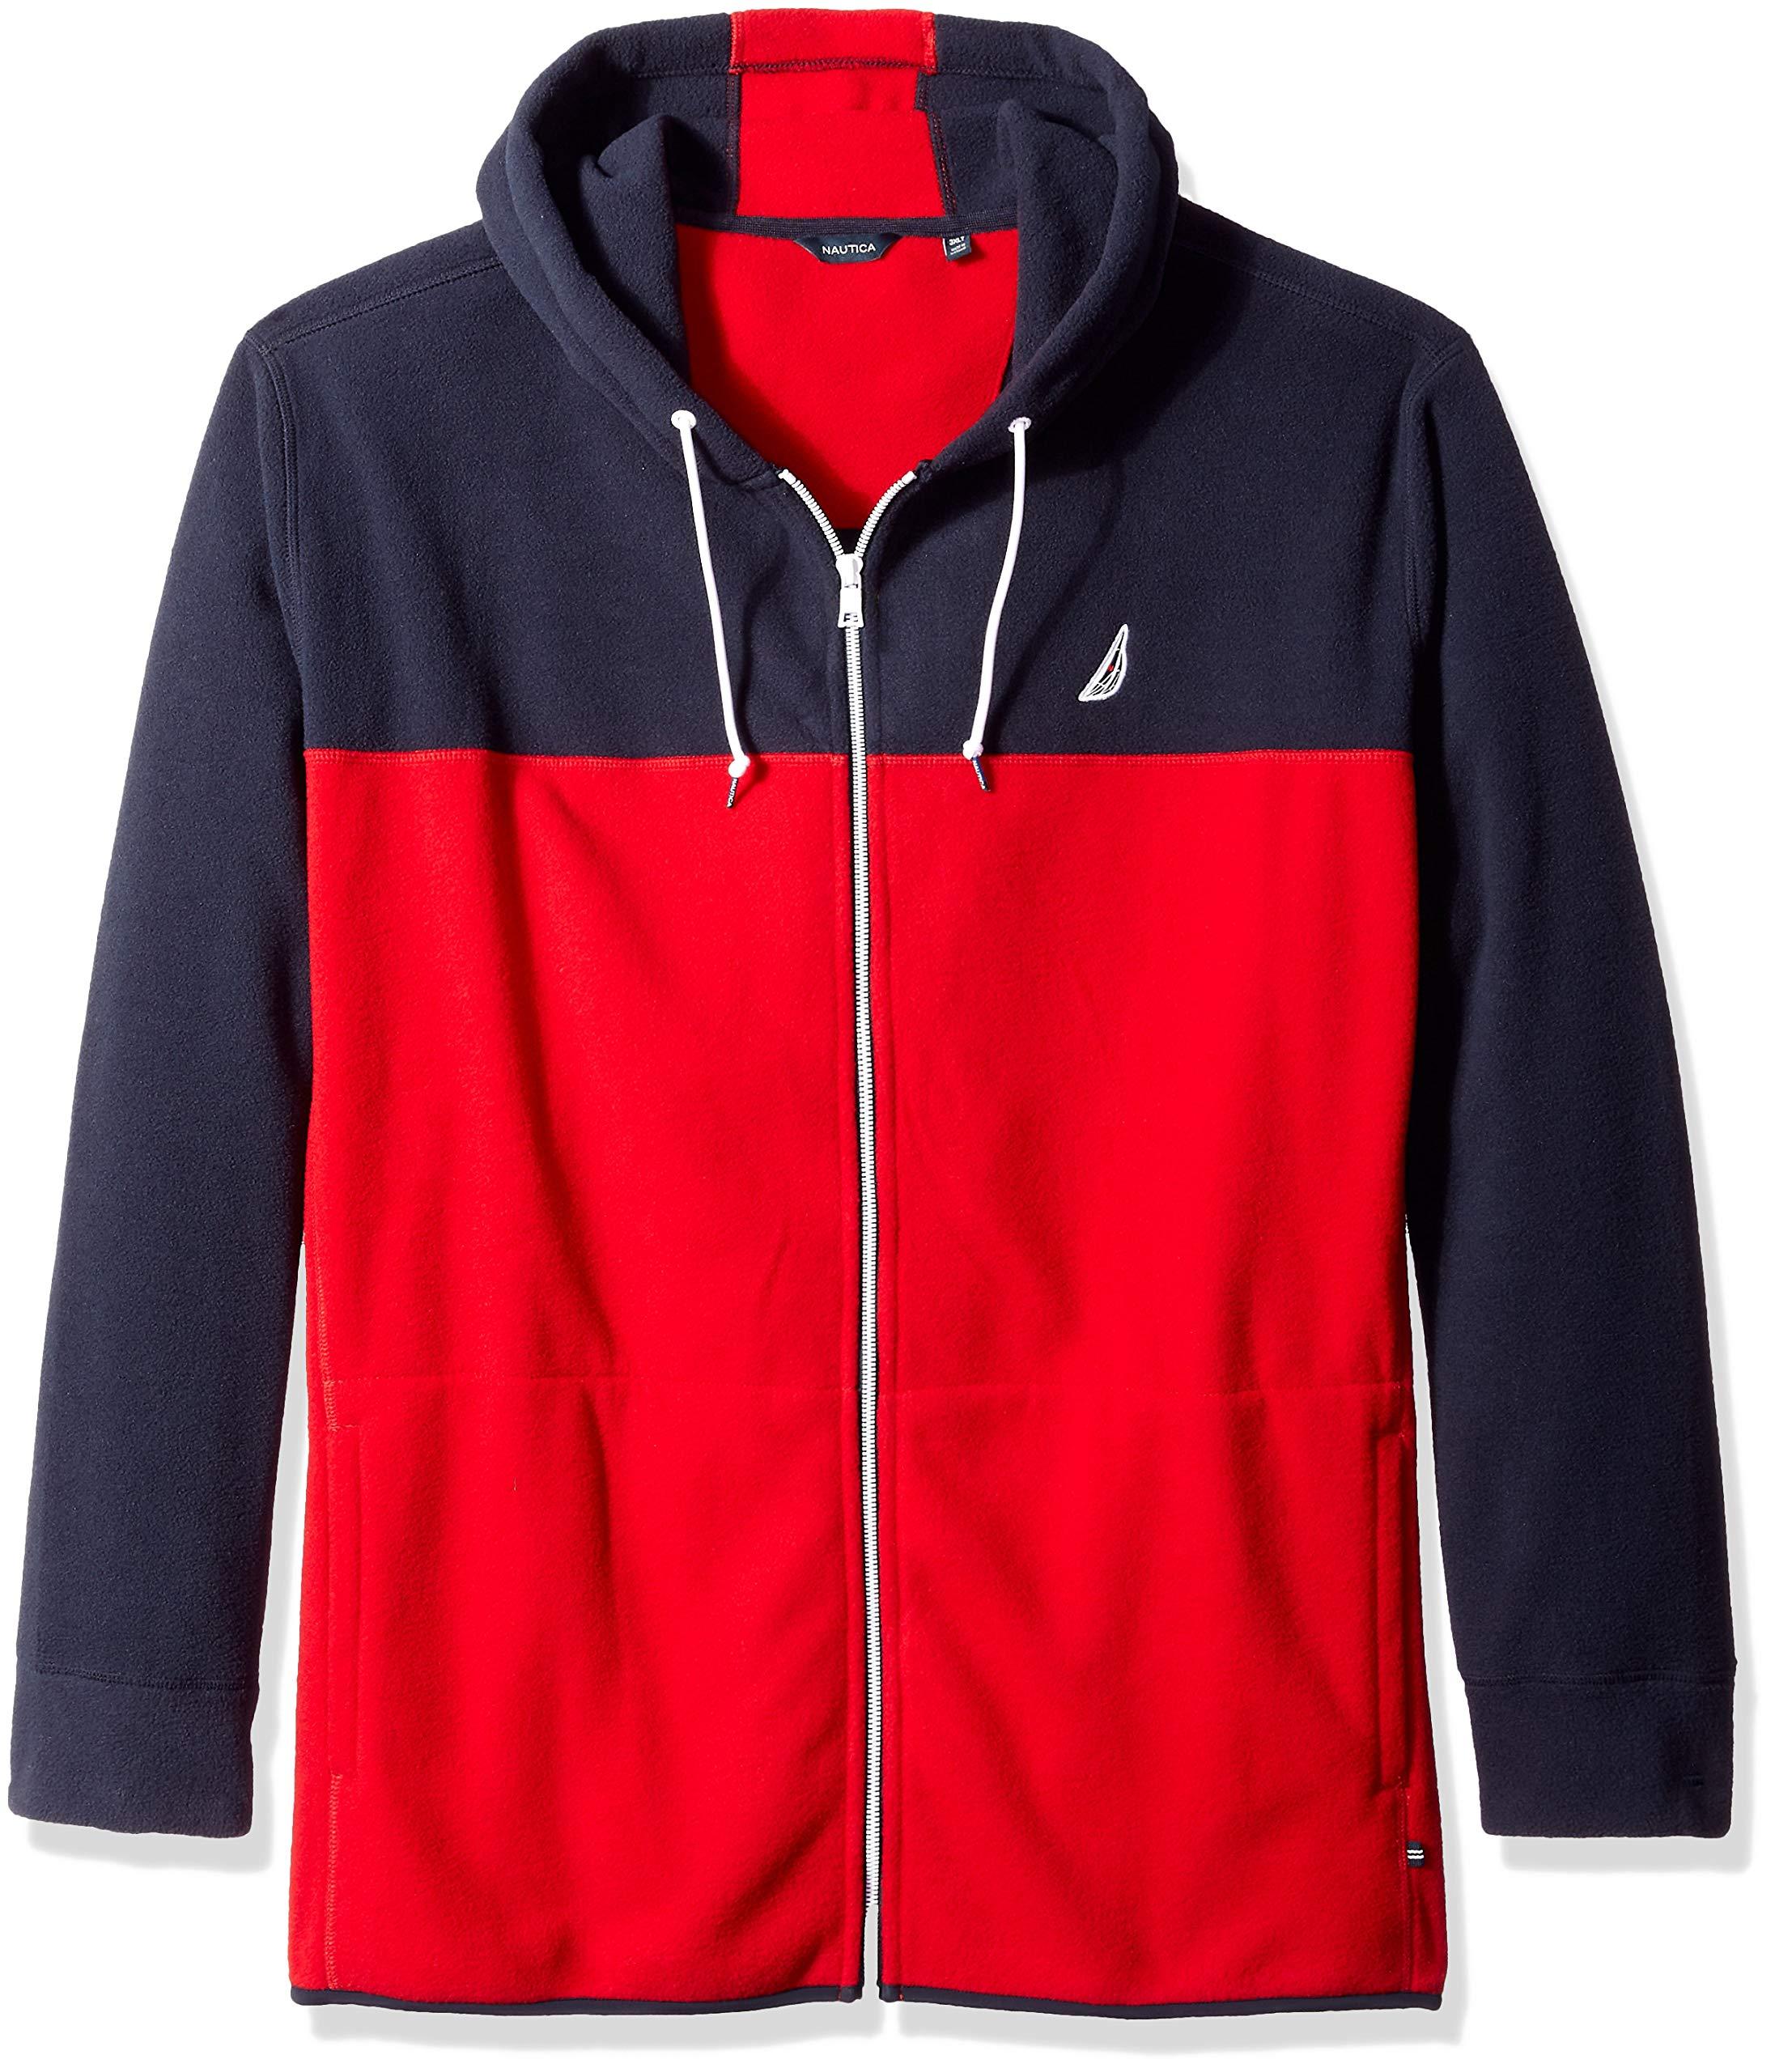 Nautica Men's Big and Tall Blocked Nautex Full-Zip Jacket Sweatshirt, Navy 4XLT